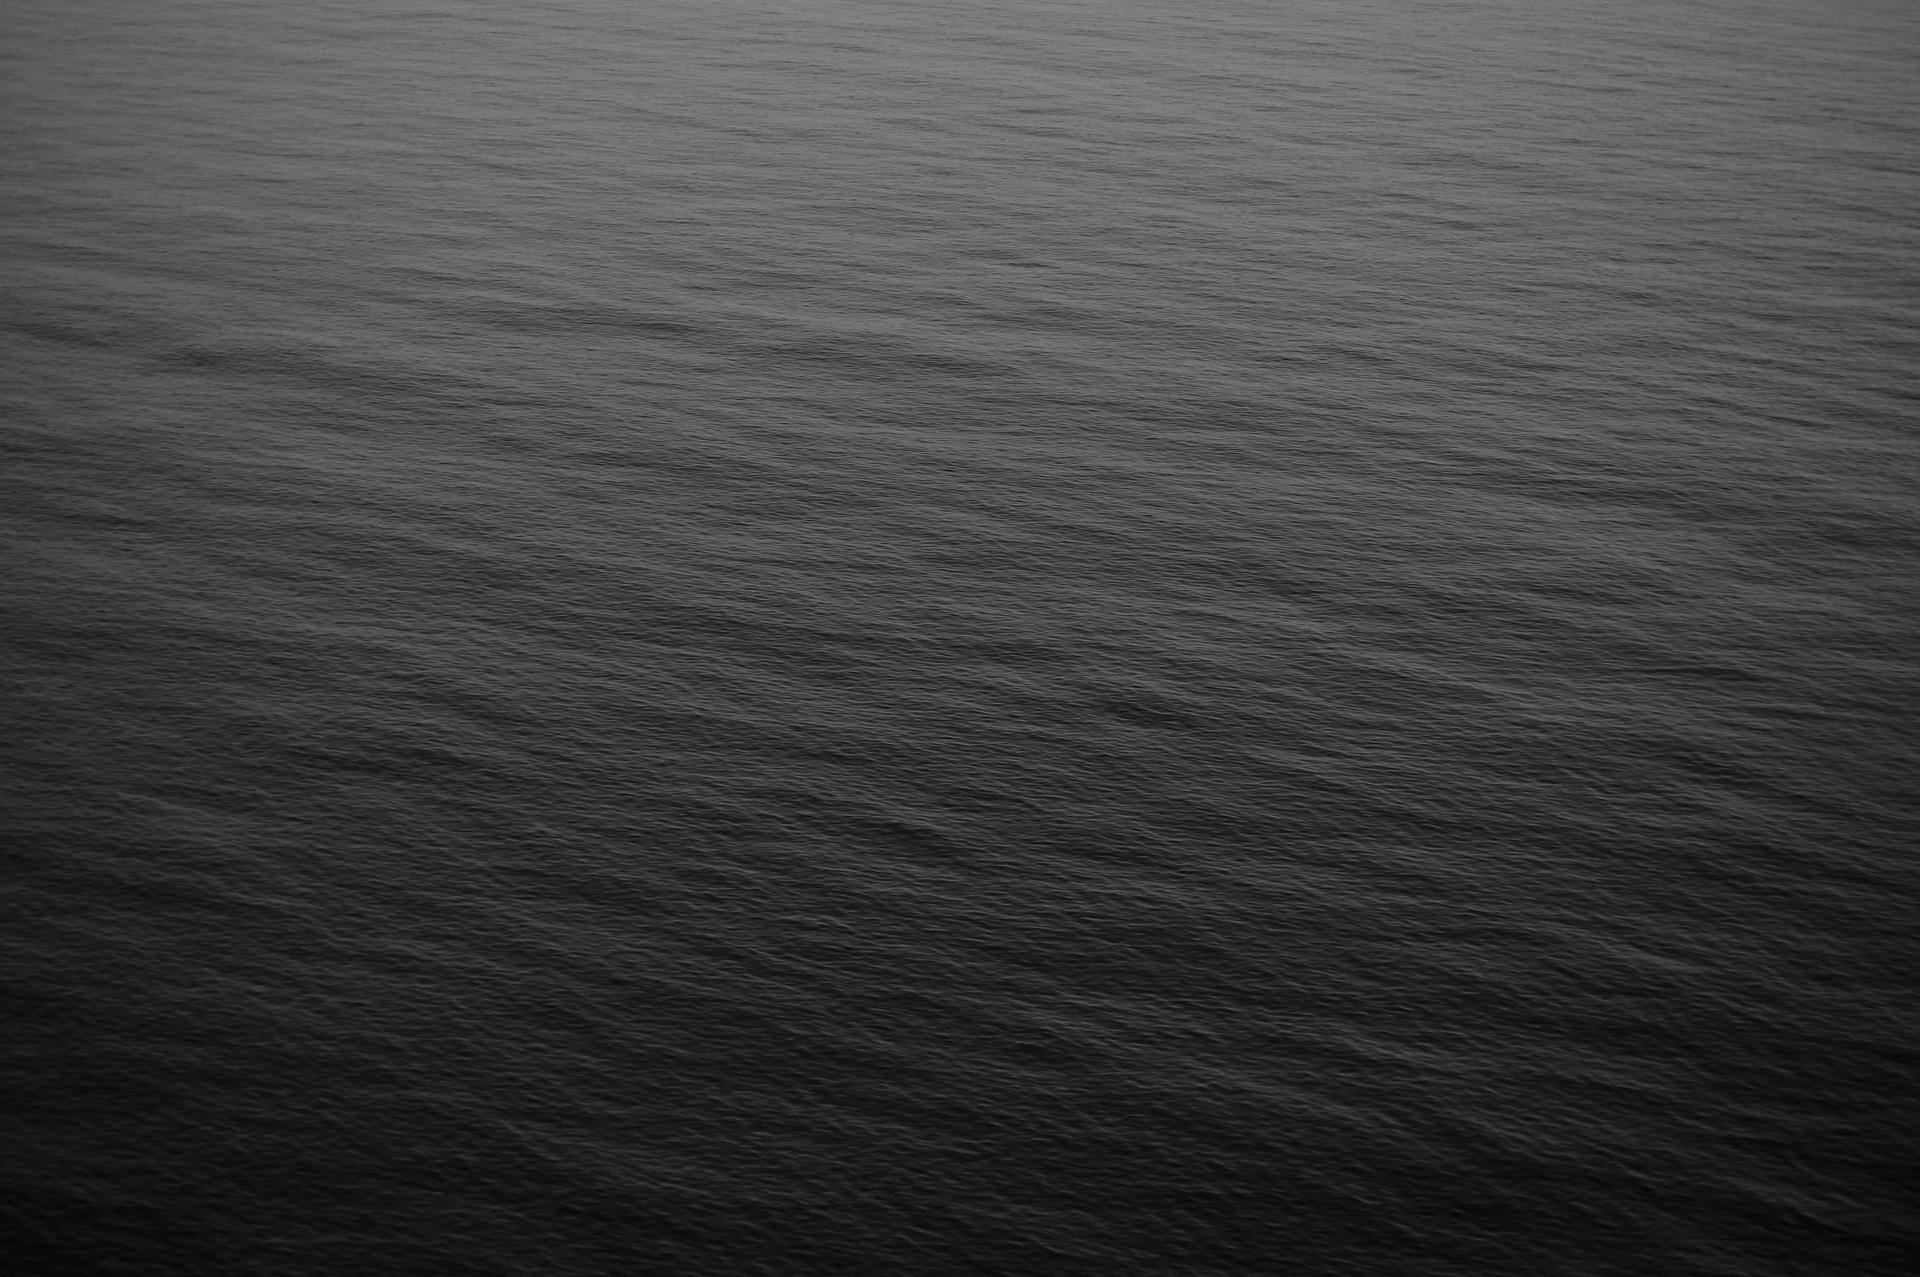 Stingray Hydrofoils Nissan 3 0 Hp Outboard Wiring Diagram Black Ocean